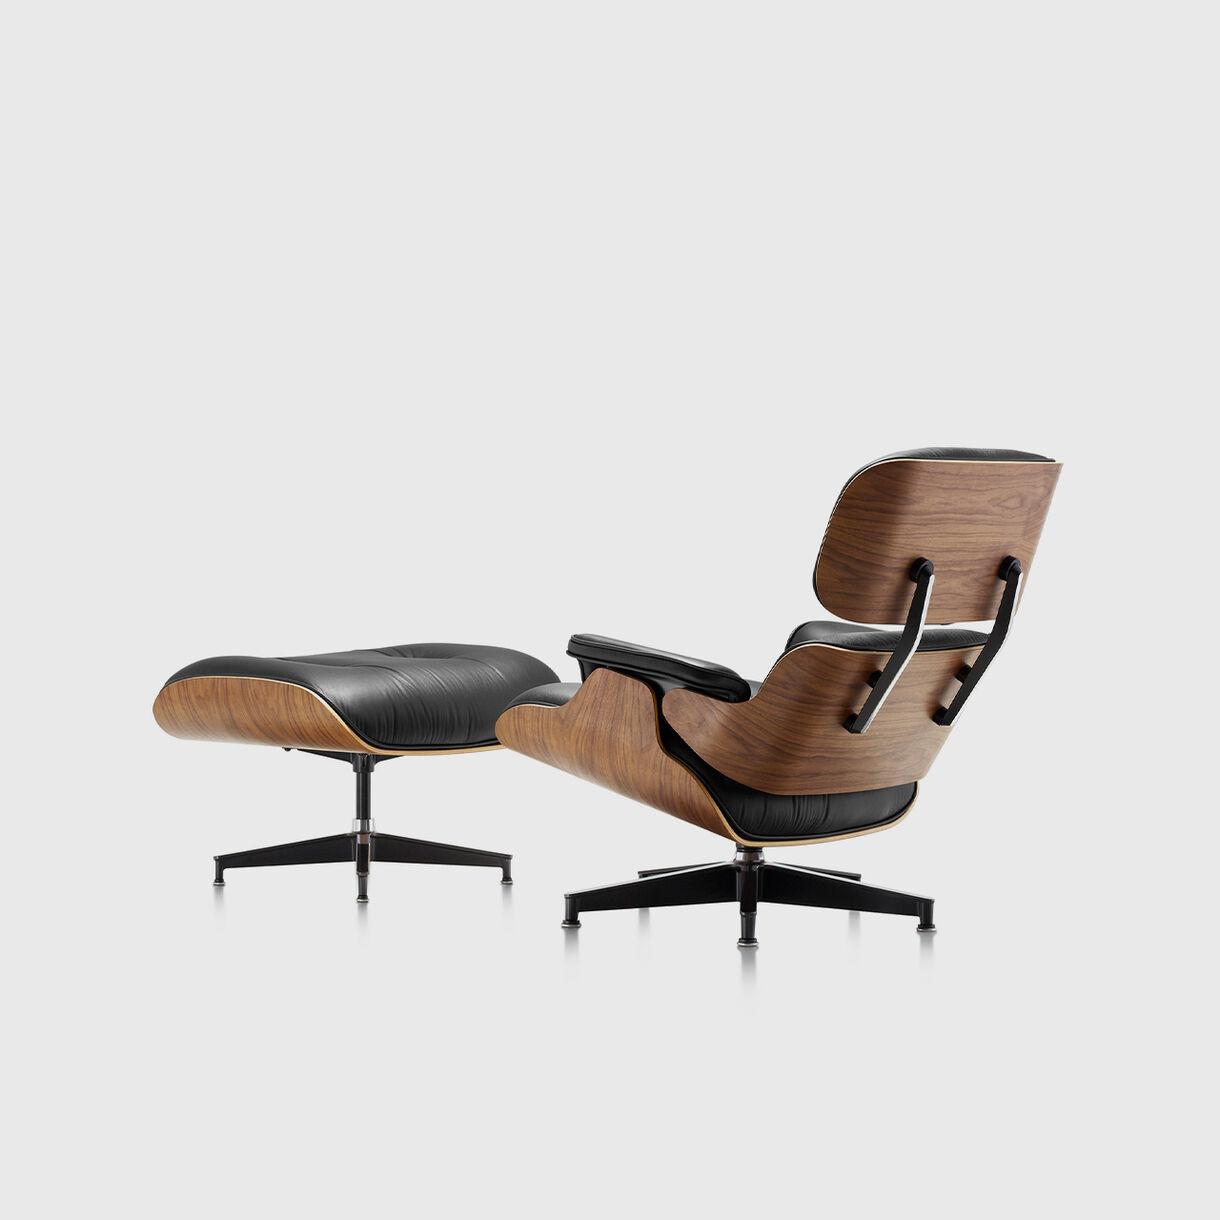 Eames Lounge Chair & Ottoman, Black & Walnut, Back Angled